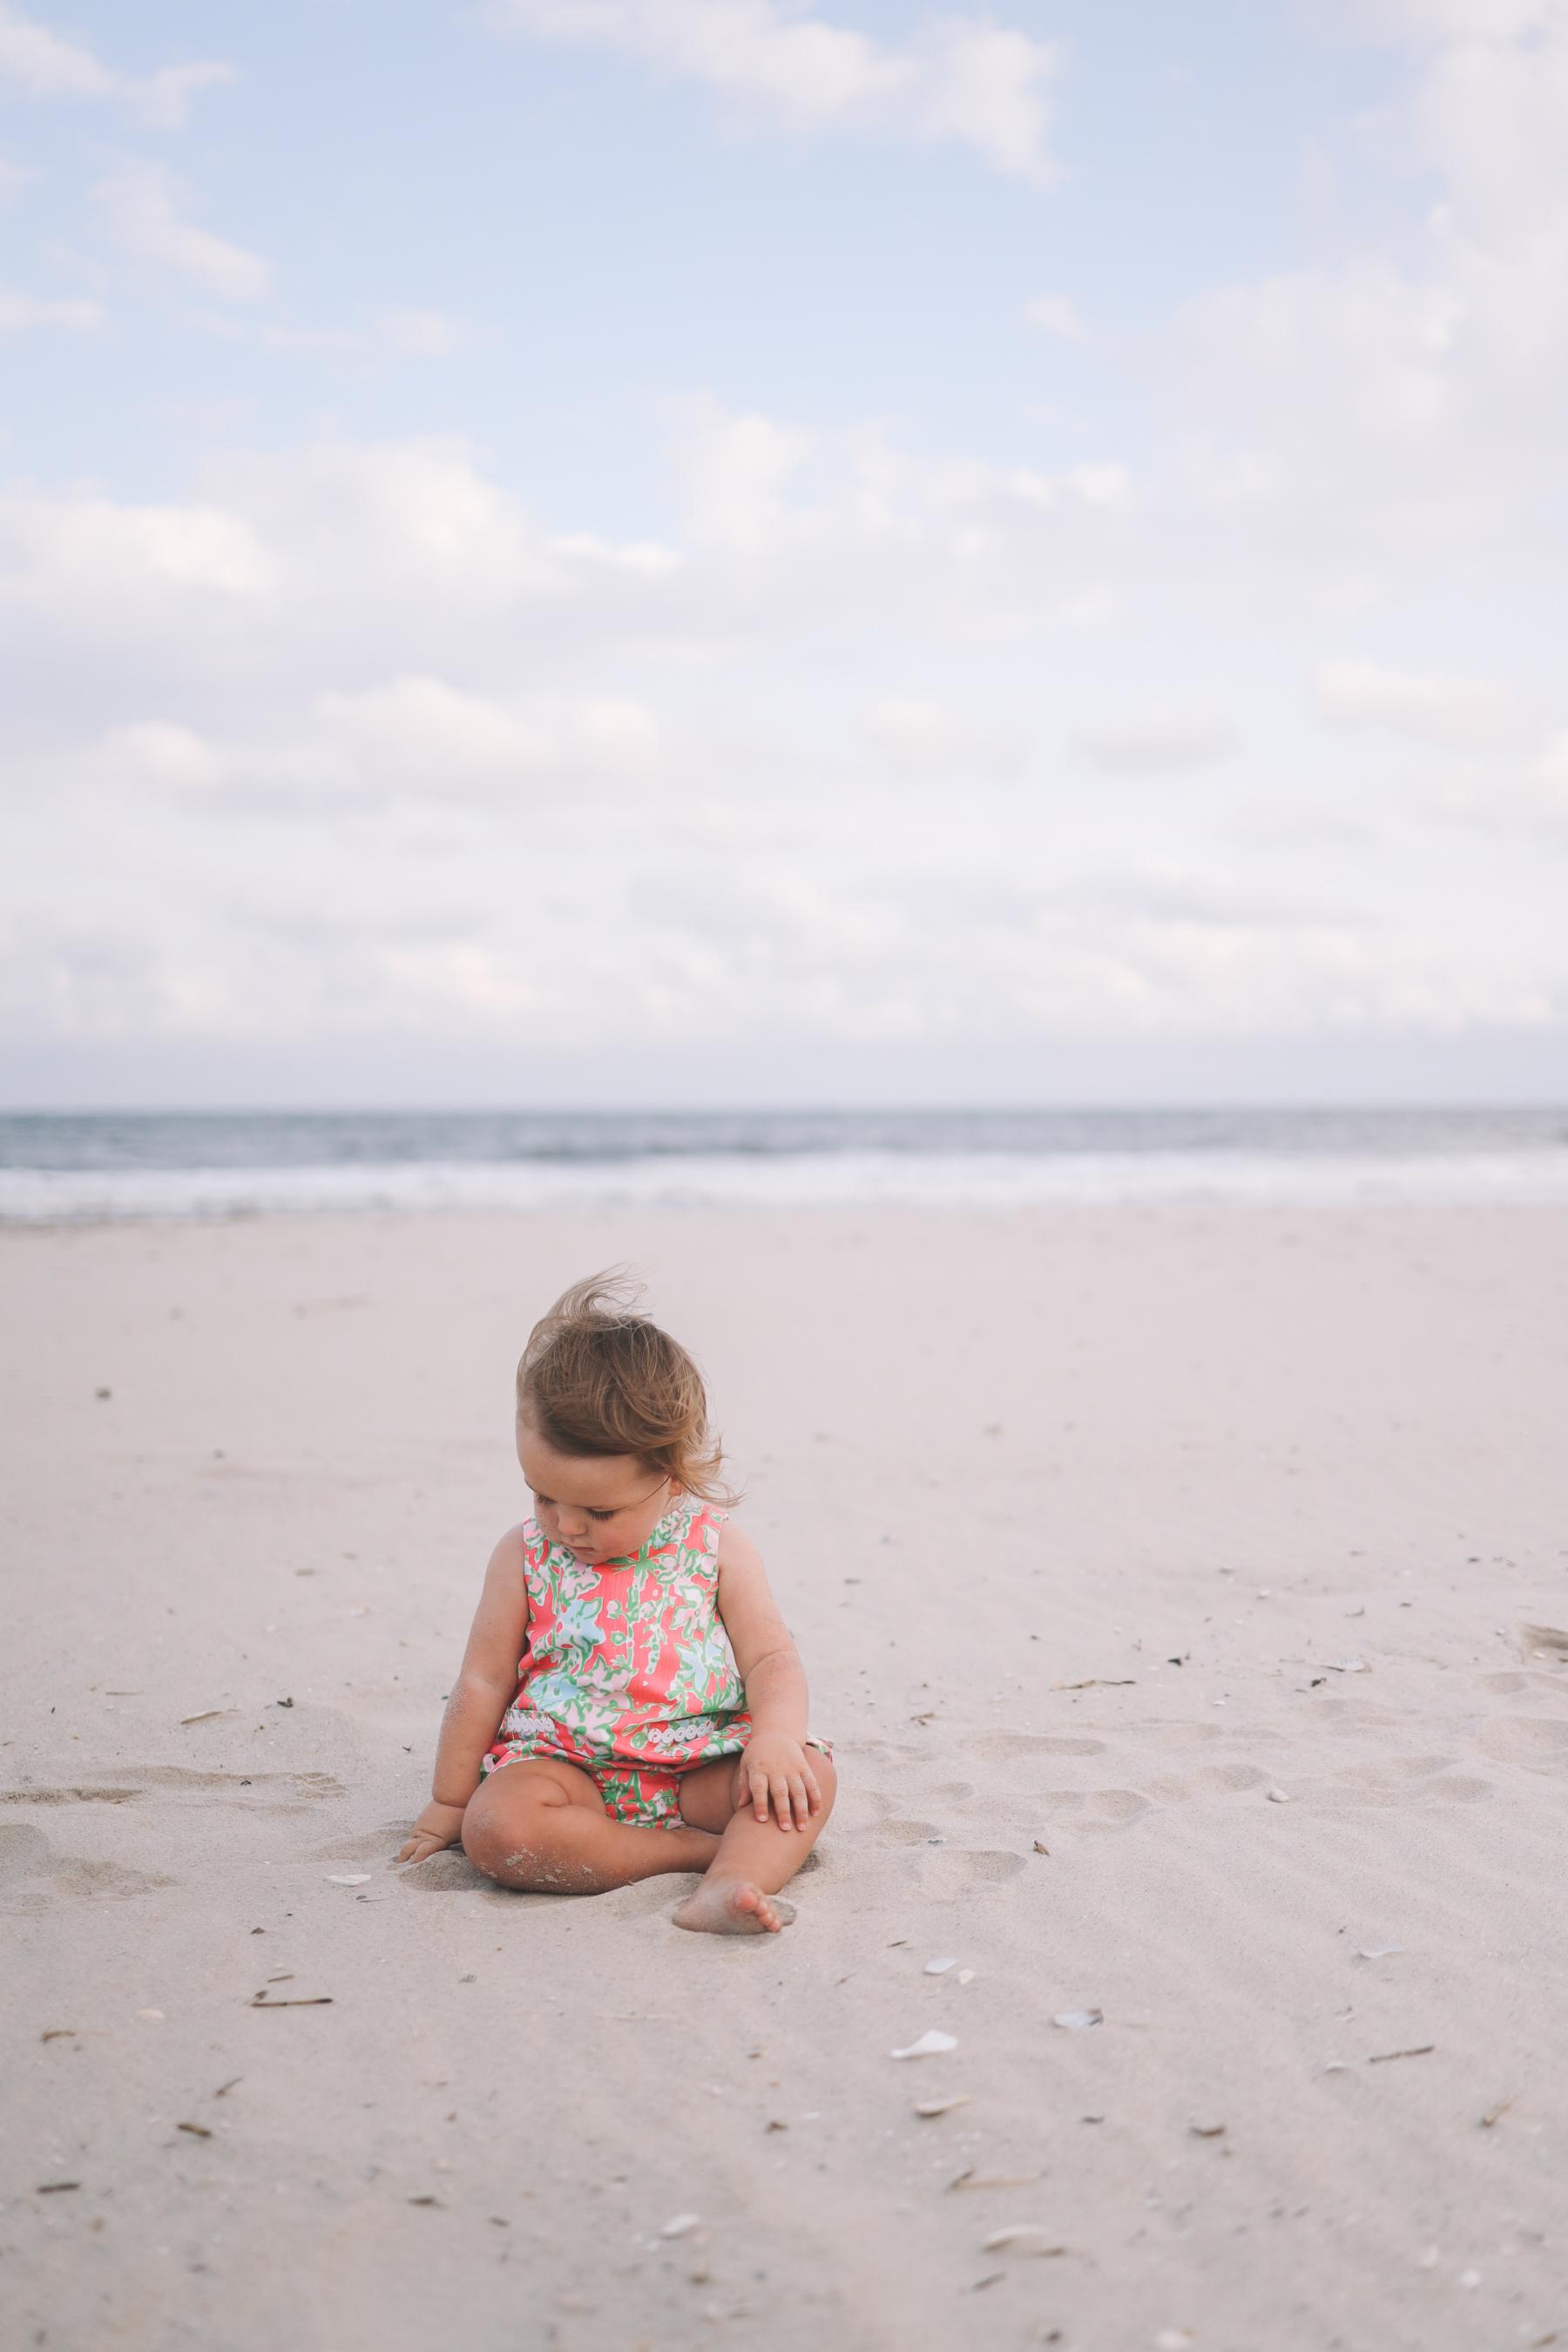 fall beach day, A White Lace Dress